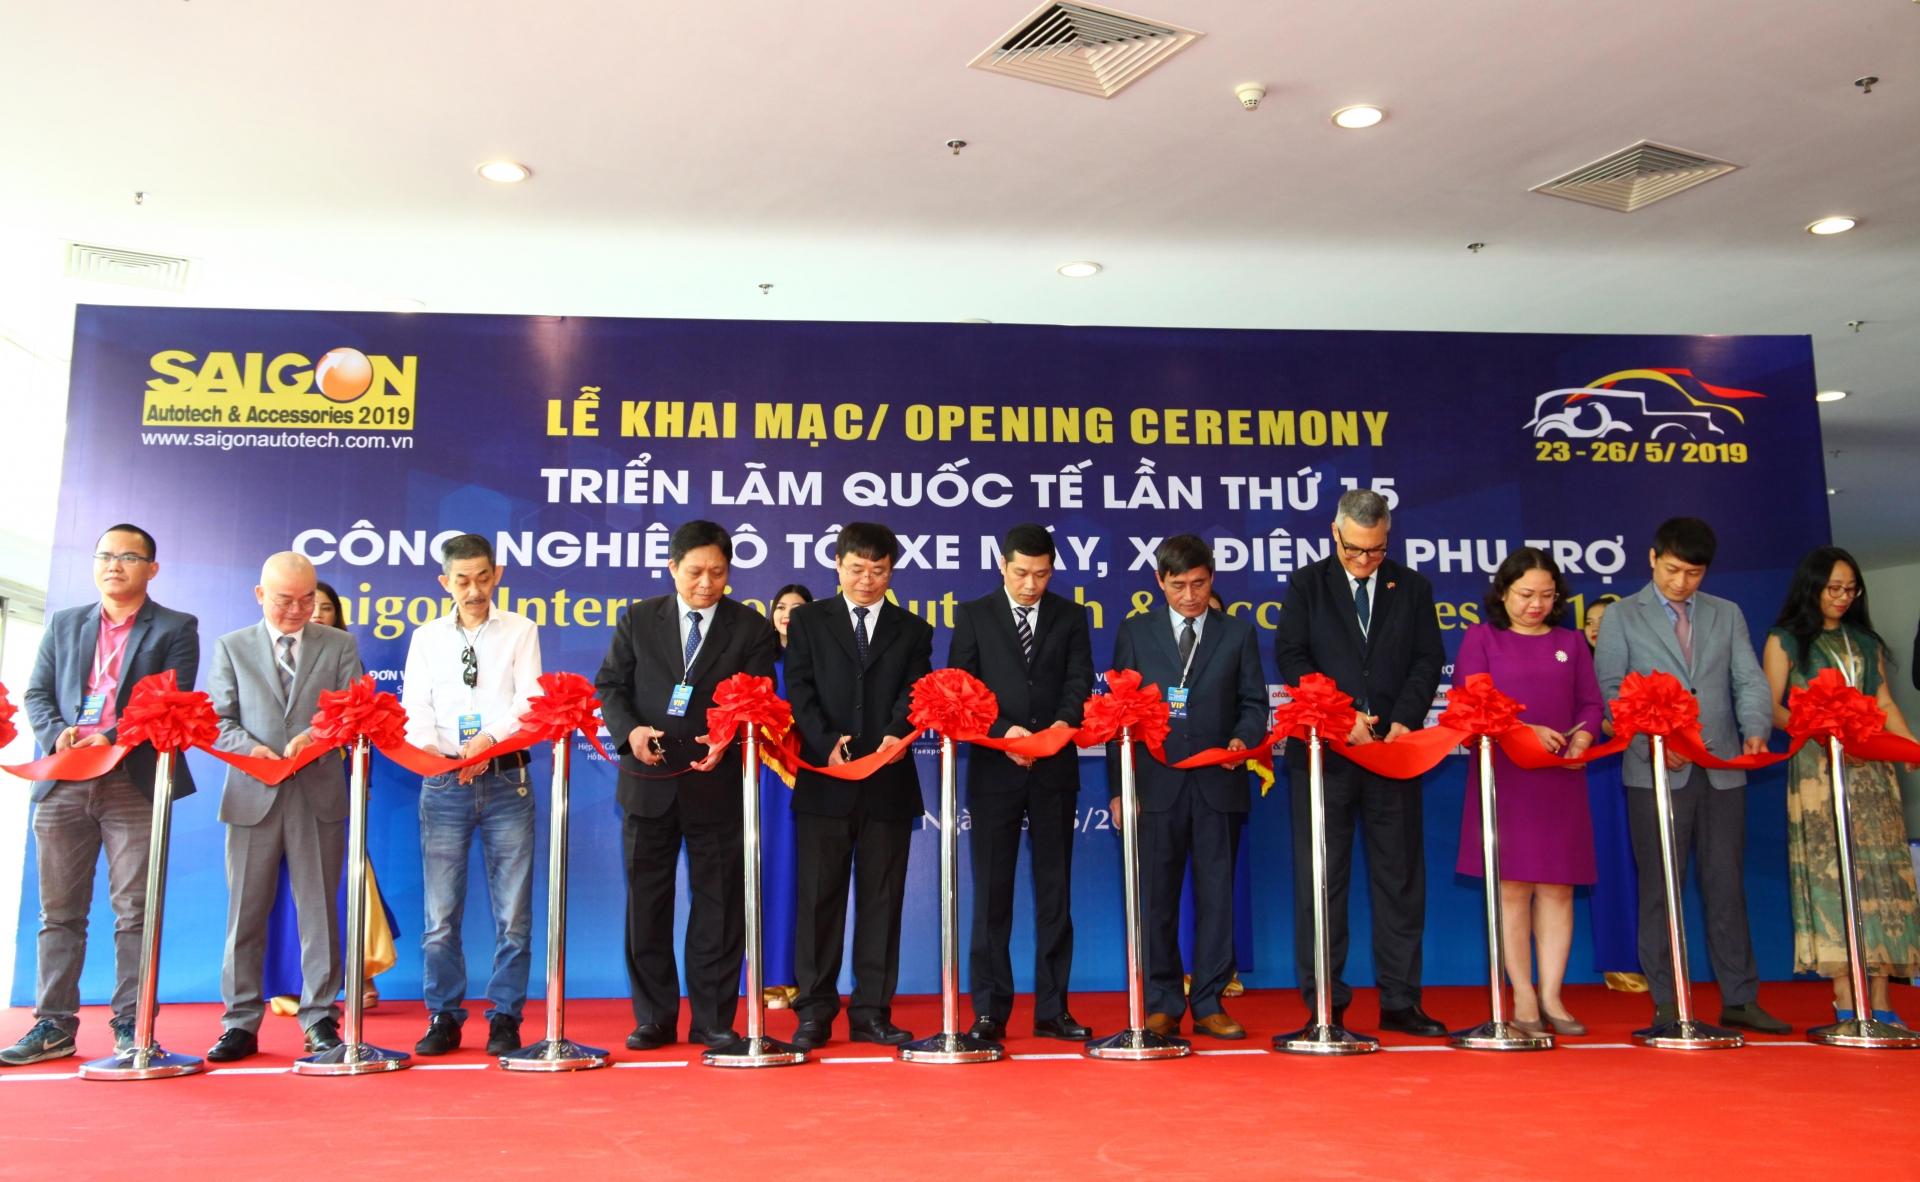 Saigon Autotech & Accessories paves foreign suppliers' way to Vietnam